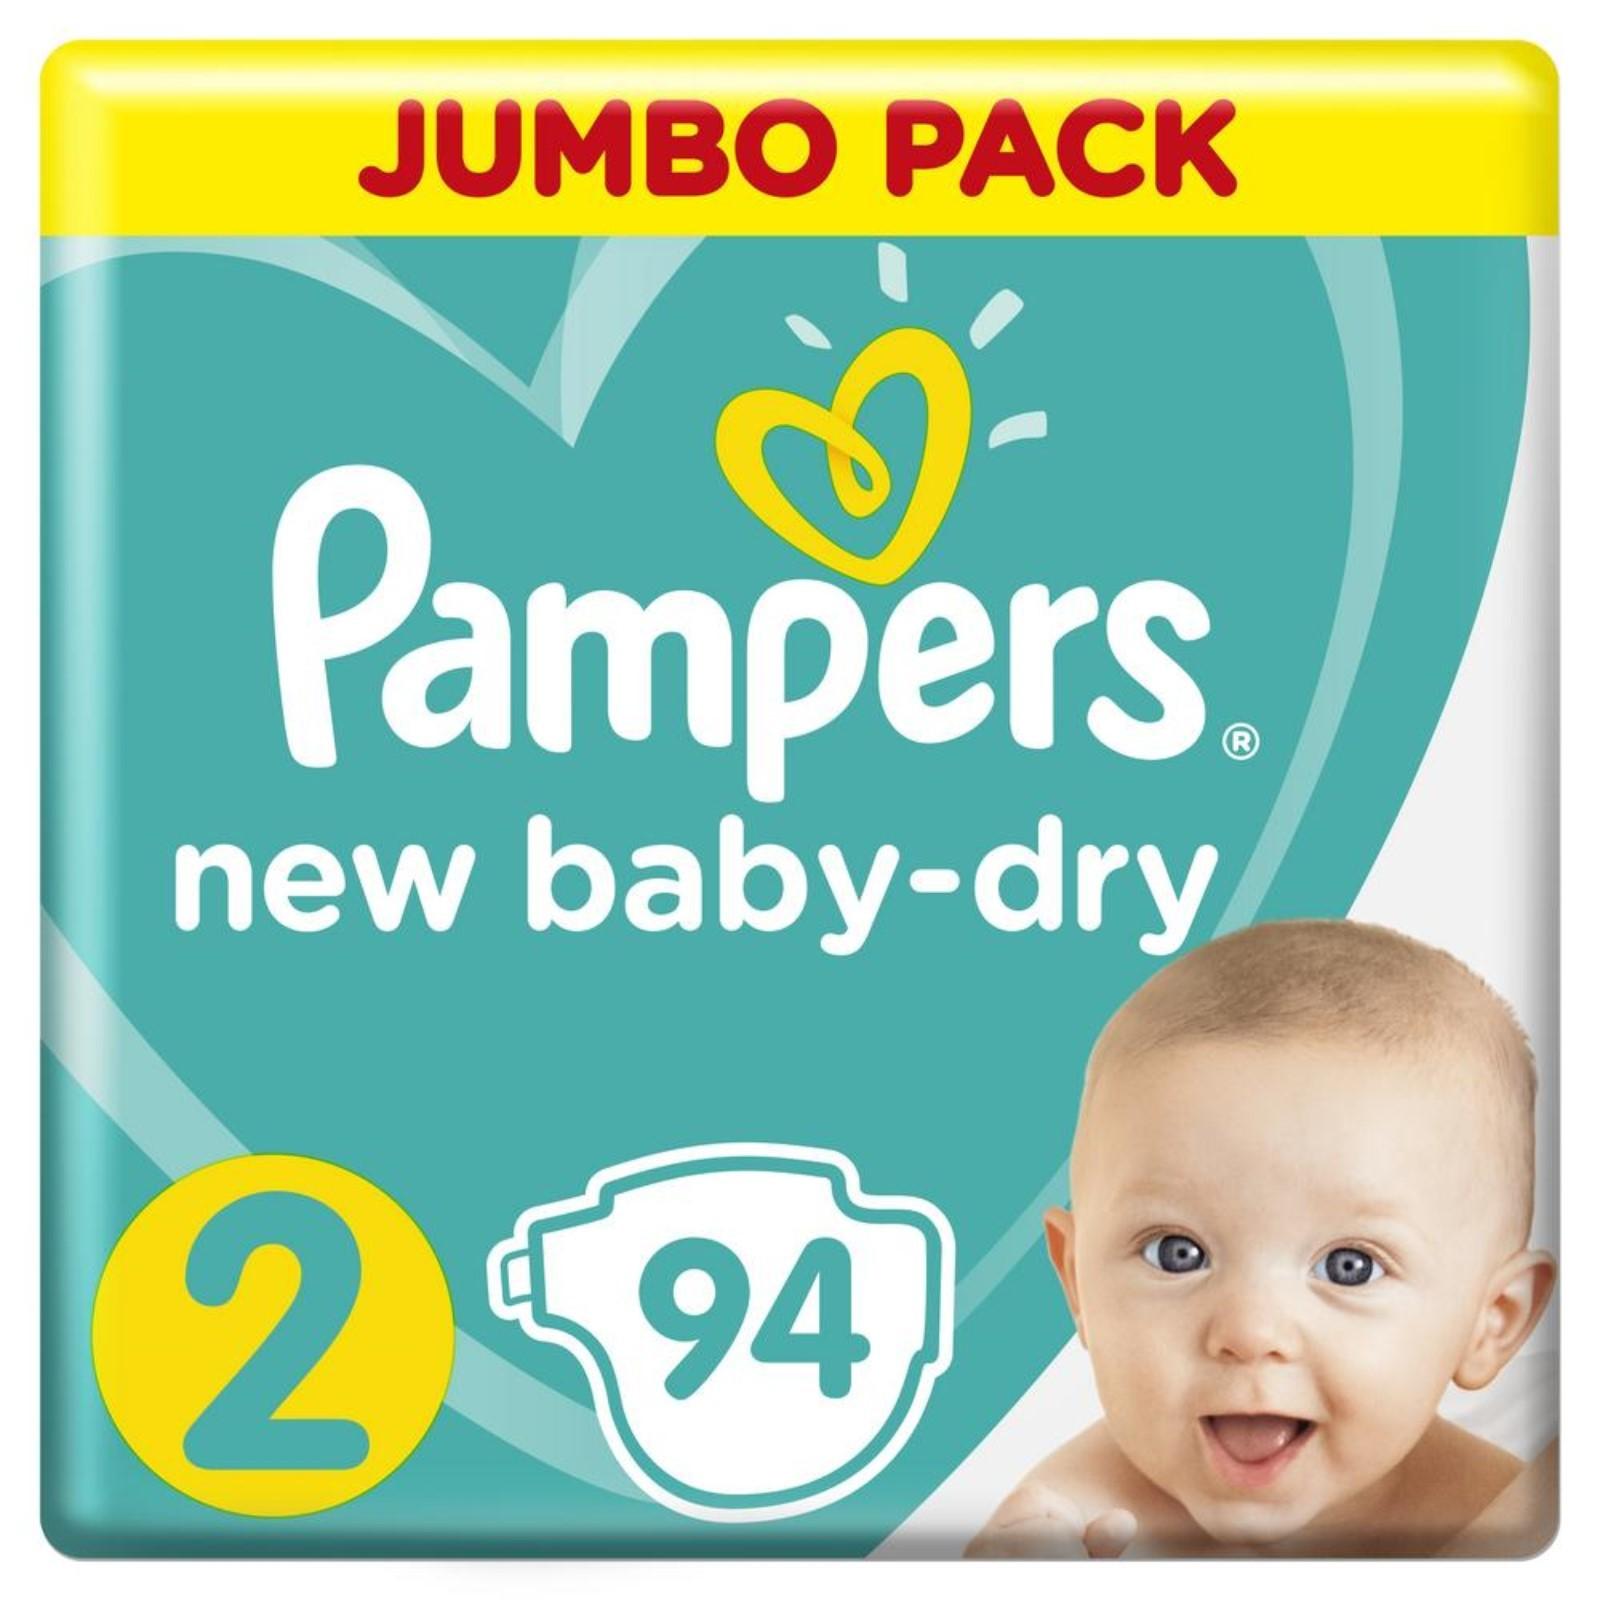 b0aebcef62e9 Подгузники Pampers New Baby-dry, Mini 2 (3-6 кг), 94 шт. (1156452 ...